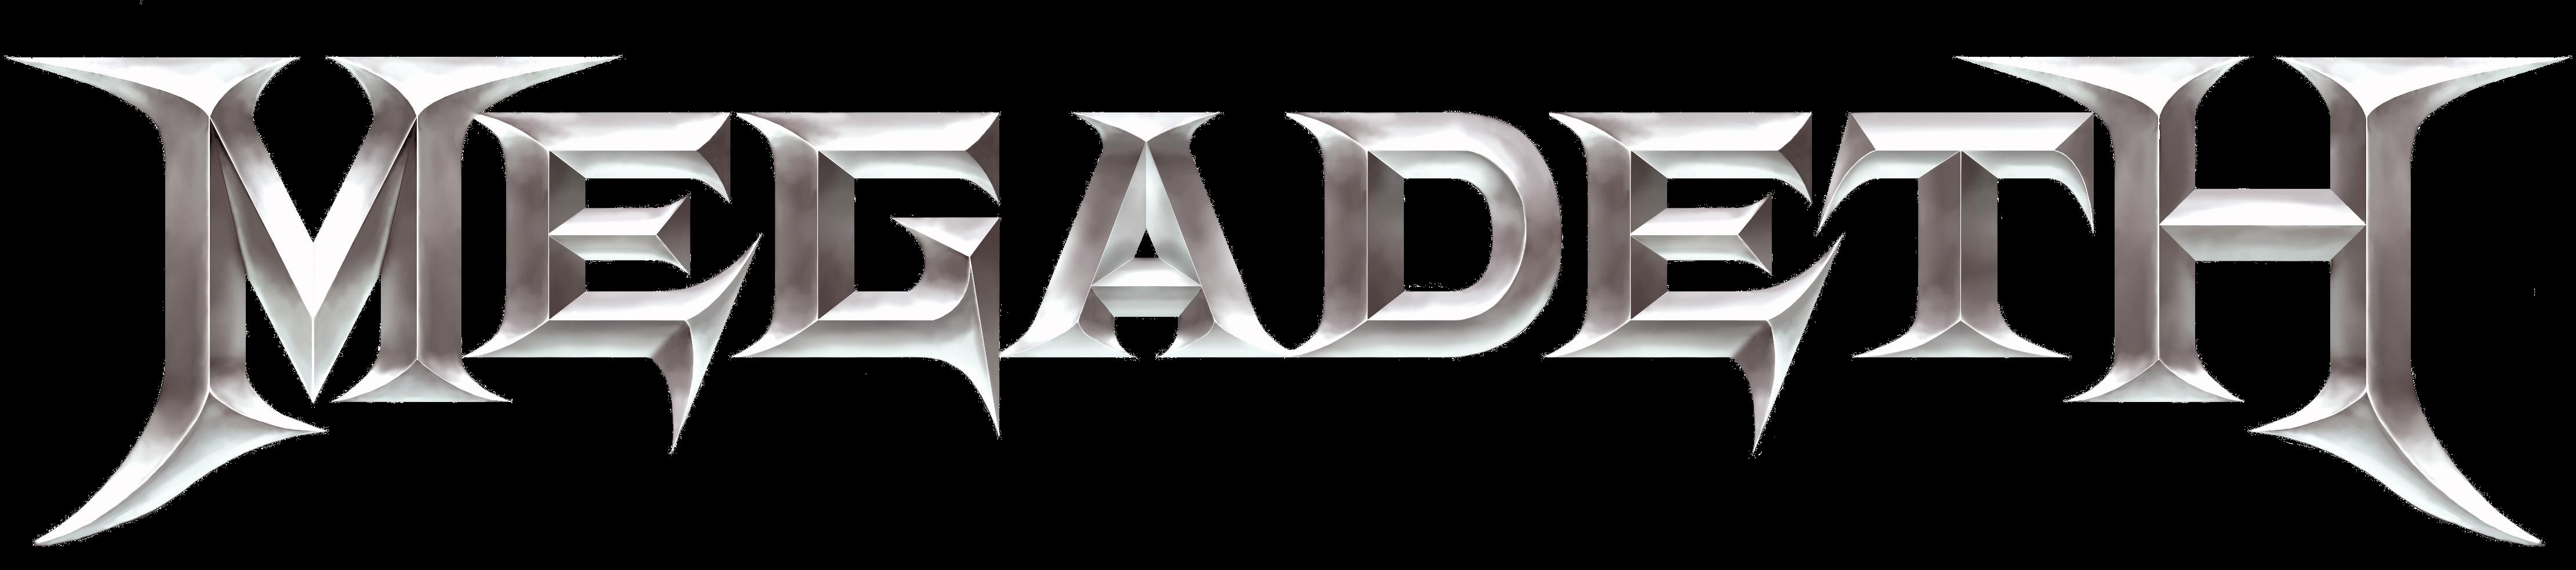 MegadethLogo1.jpg